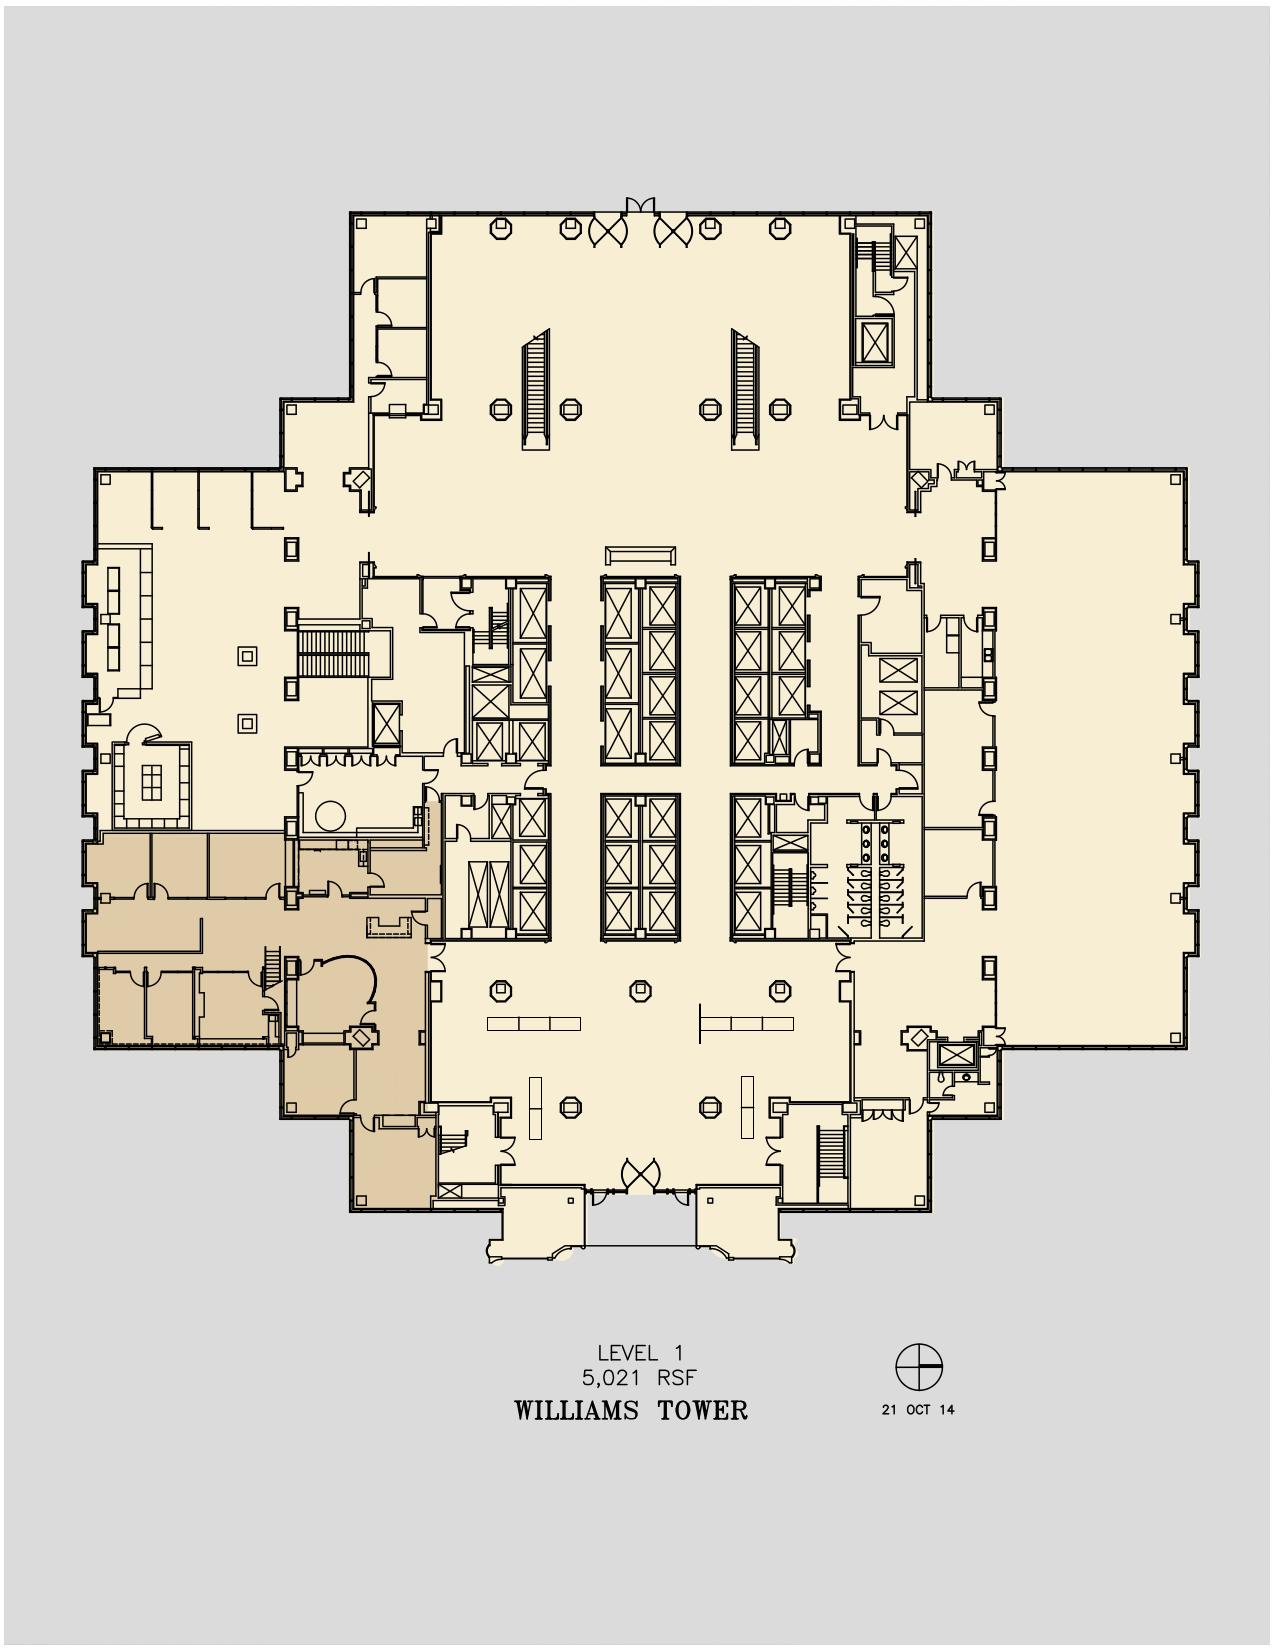 Williams Tower 2800 Post Oak Blvd 1st Floor Unit 111 Vts